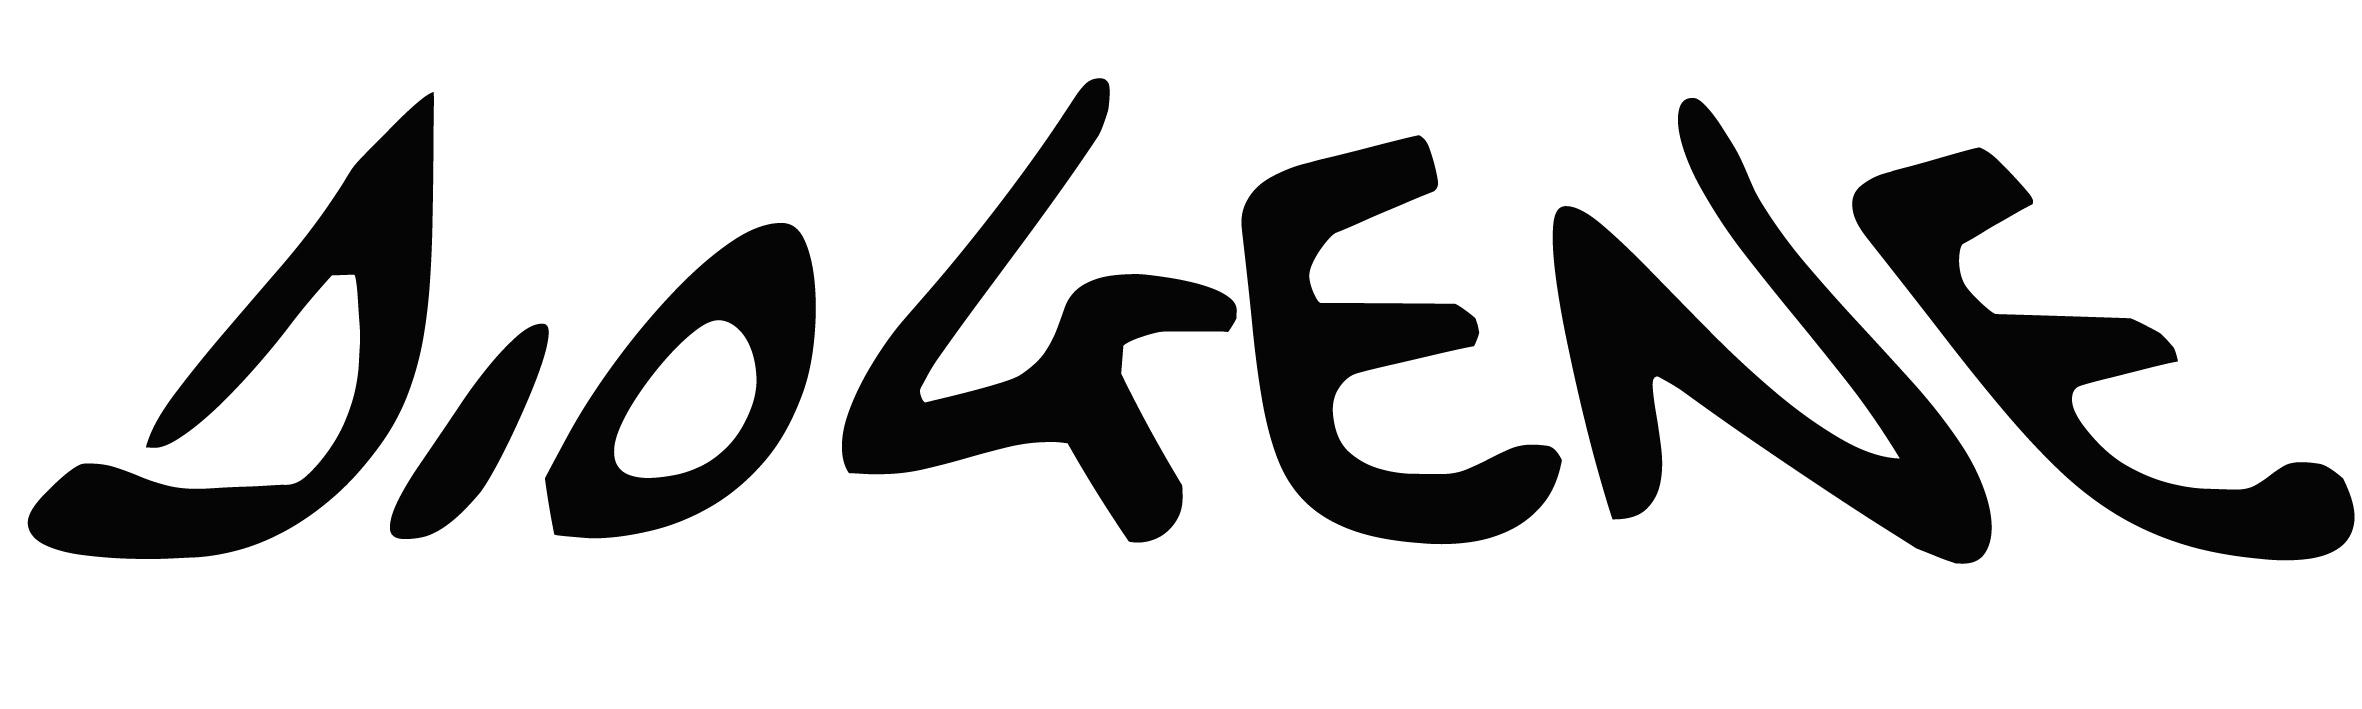 Diogenes logo